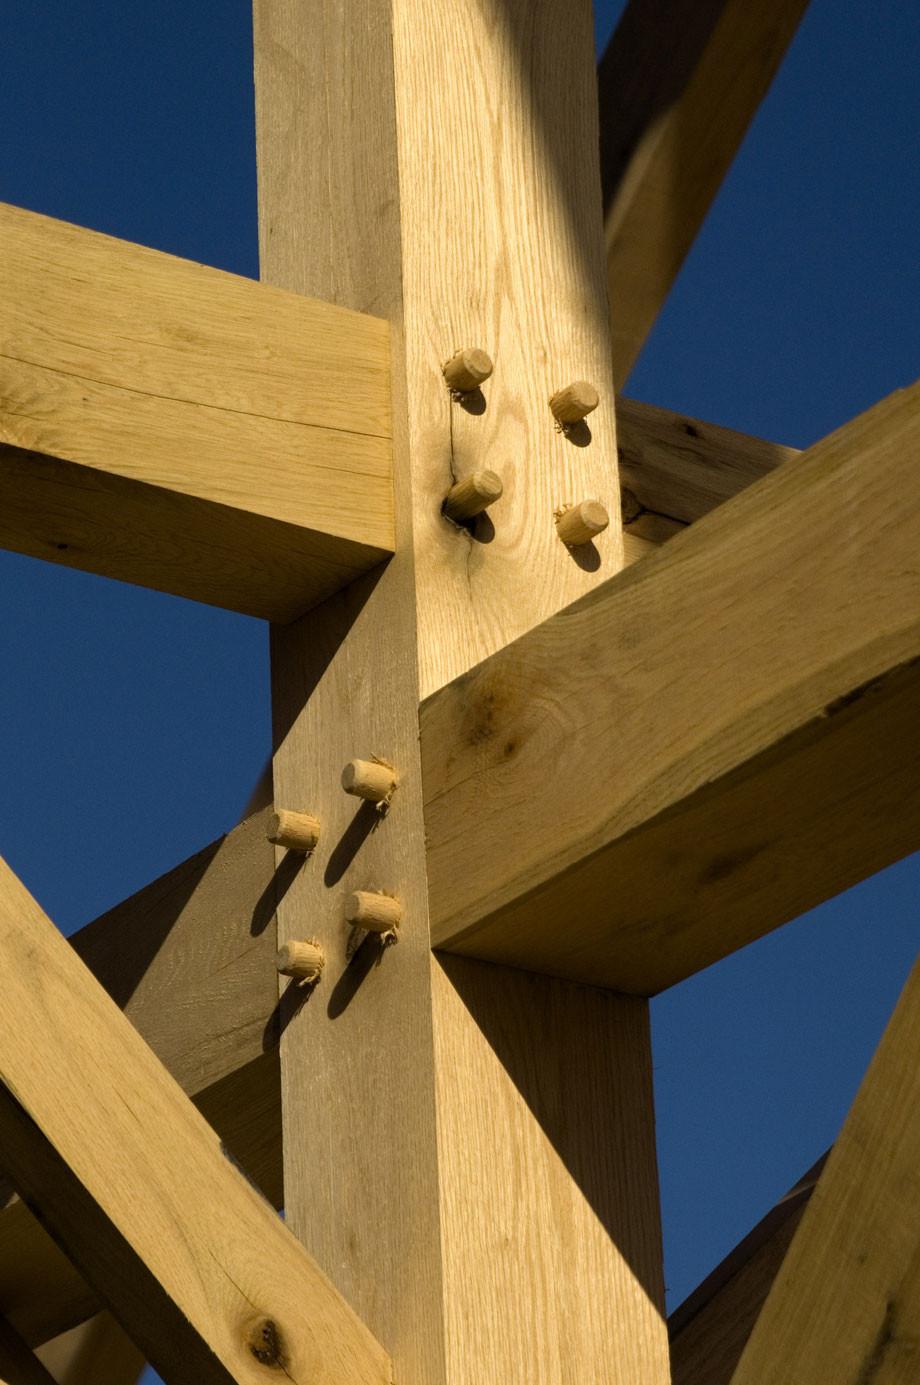 4-09-Drobish-Barn-01-10-06